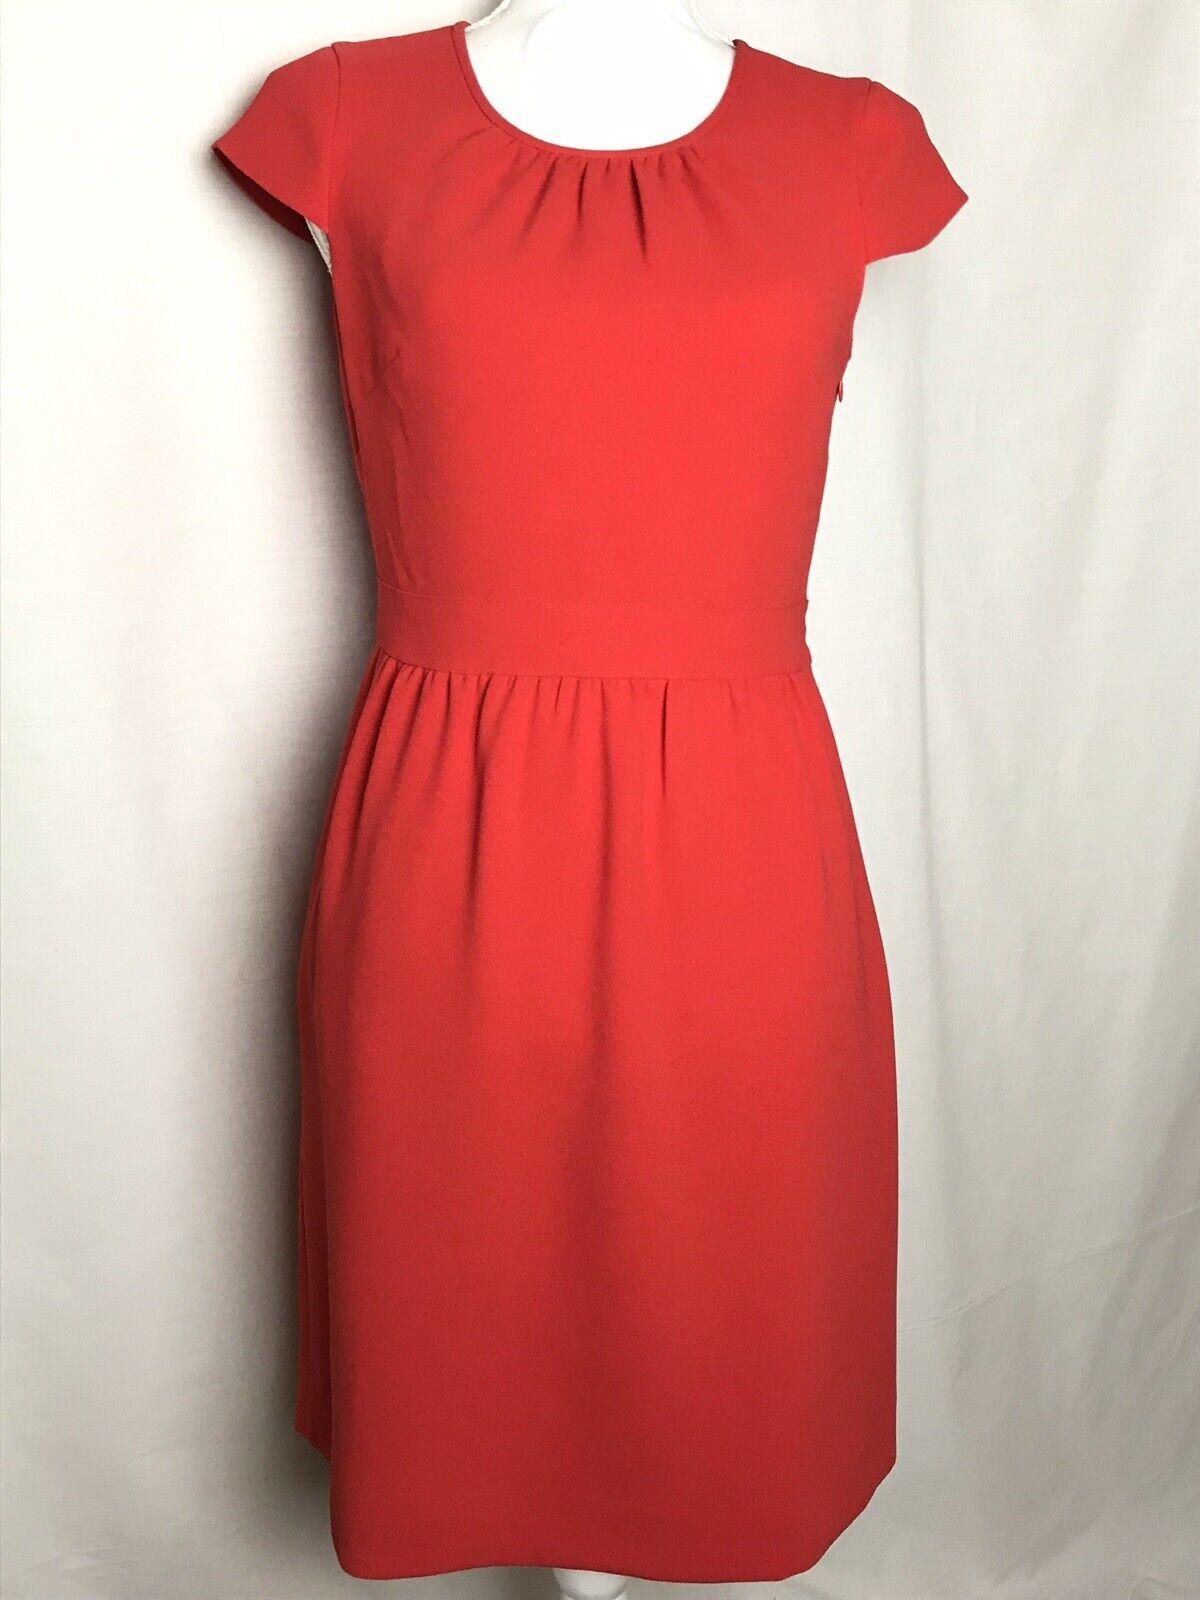 J. Crew rot Dress Sz 4 Cap Sleeve Career Wear Fitted NWT